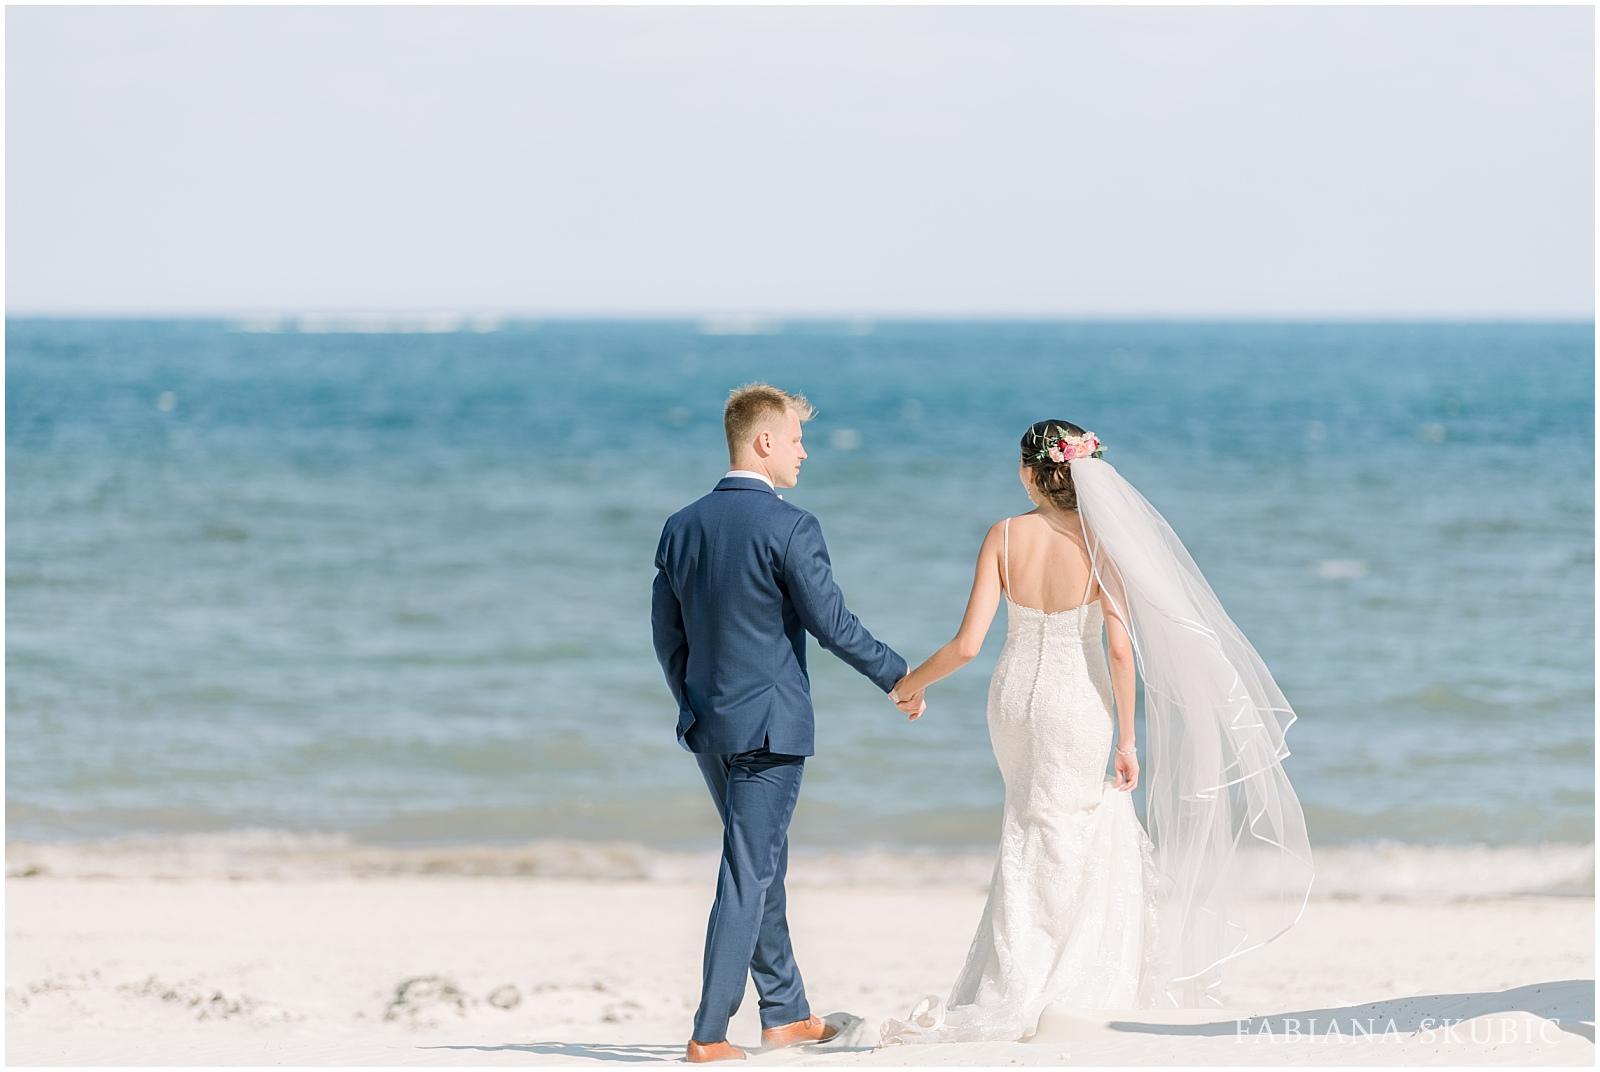 TJ_Now_Sapphire_Riviera_Cancun_Mexico_Wedding_Photos_0199.jpg